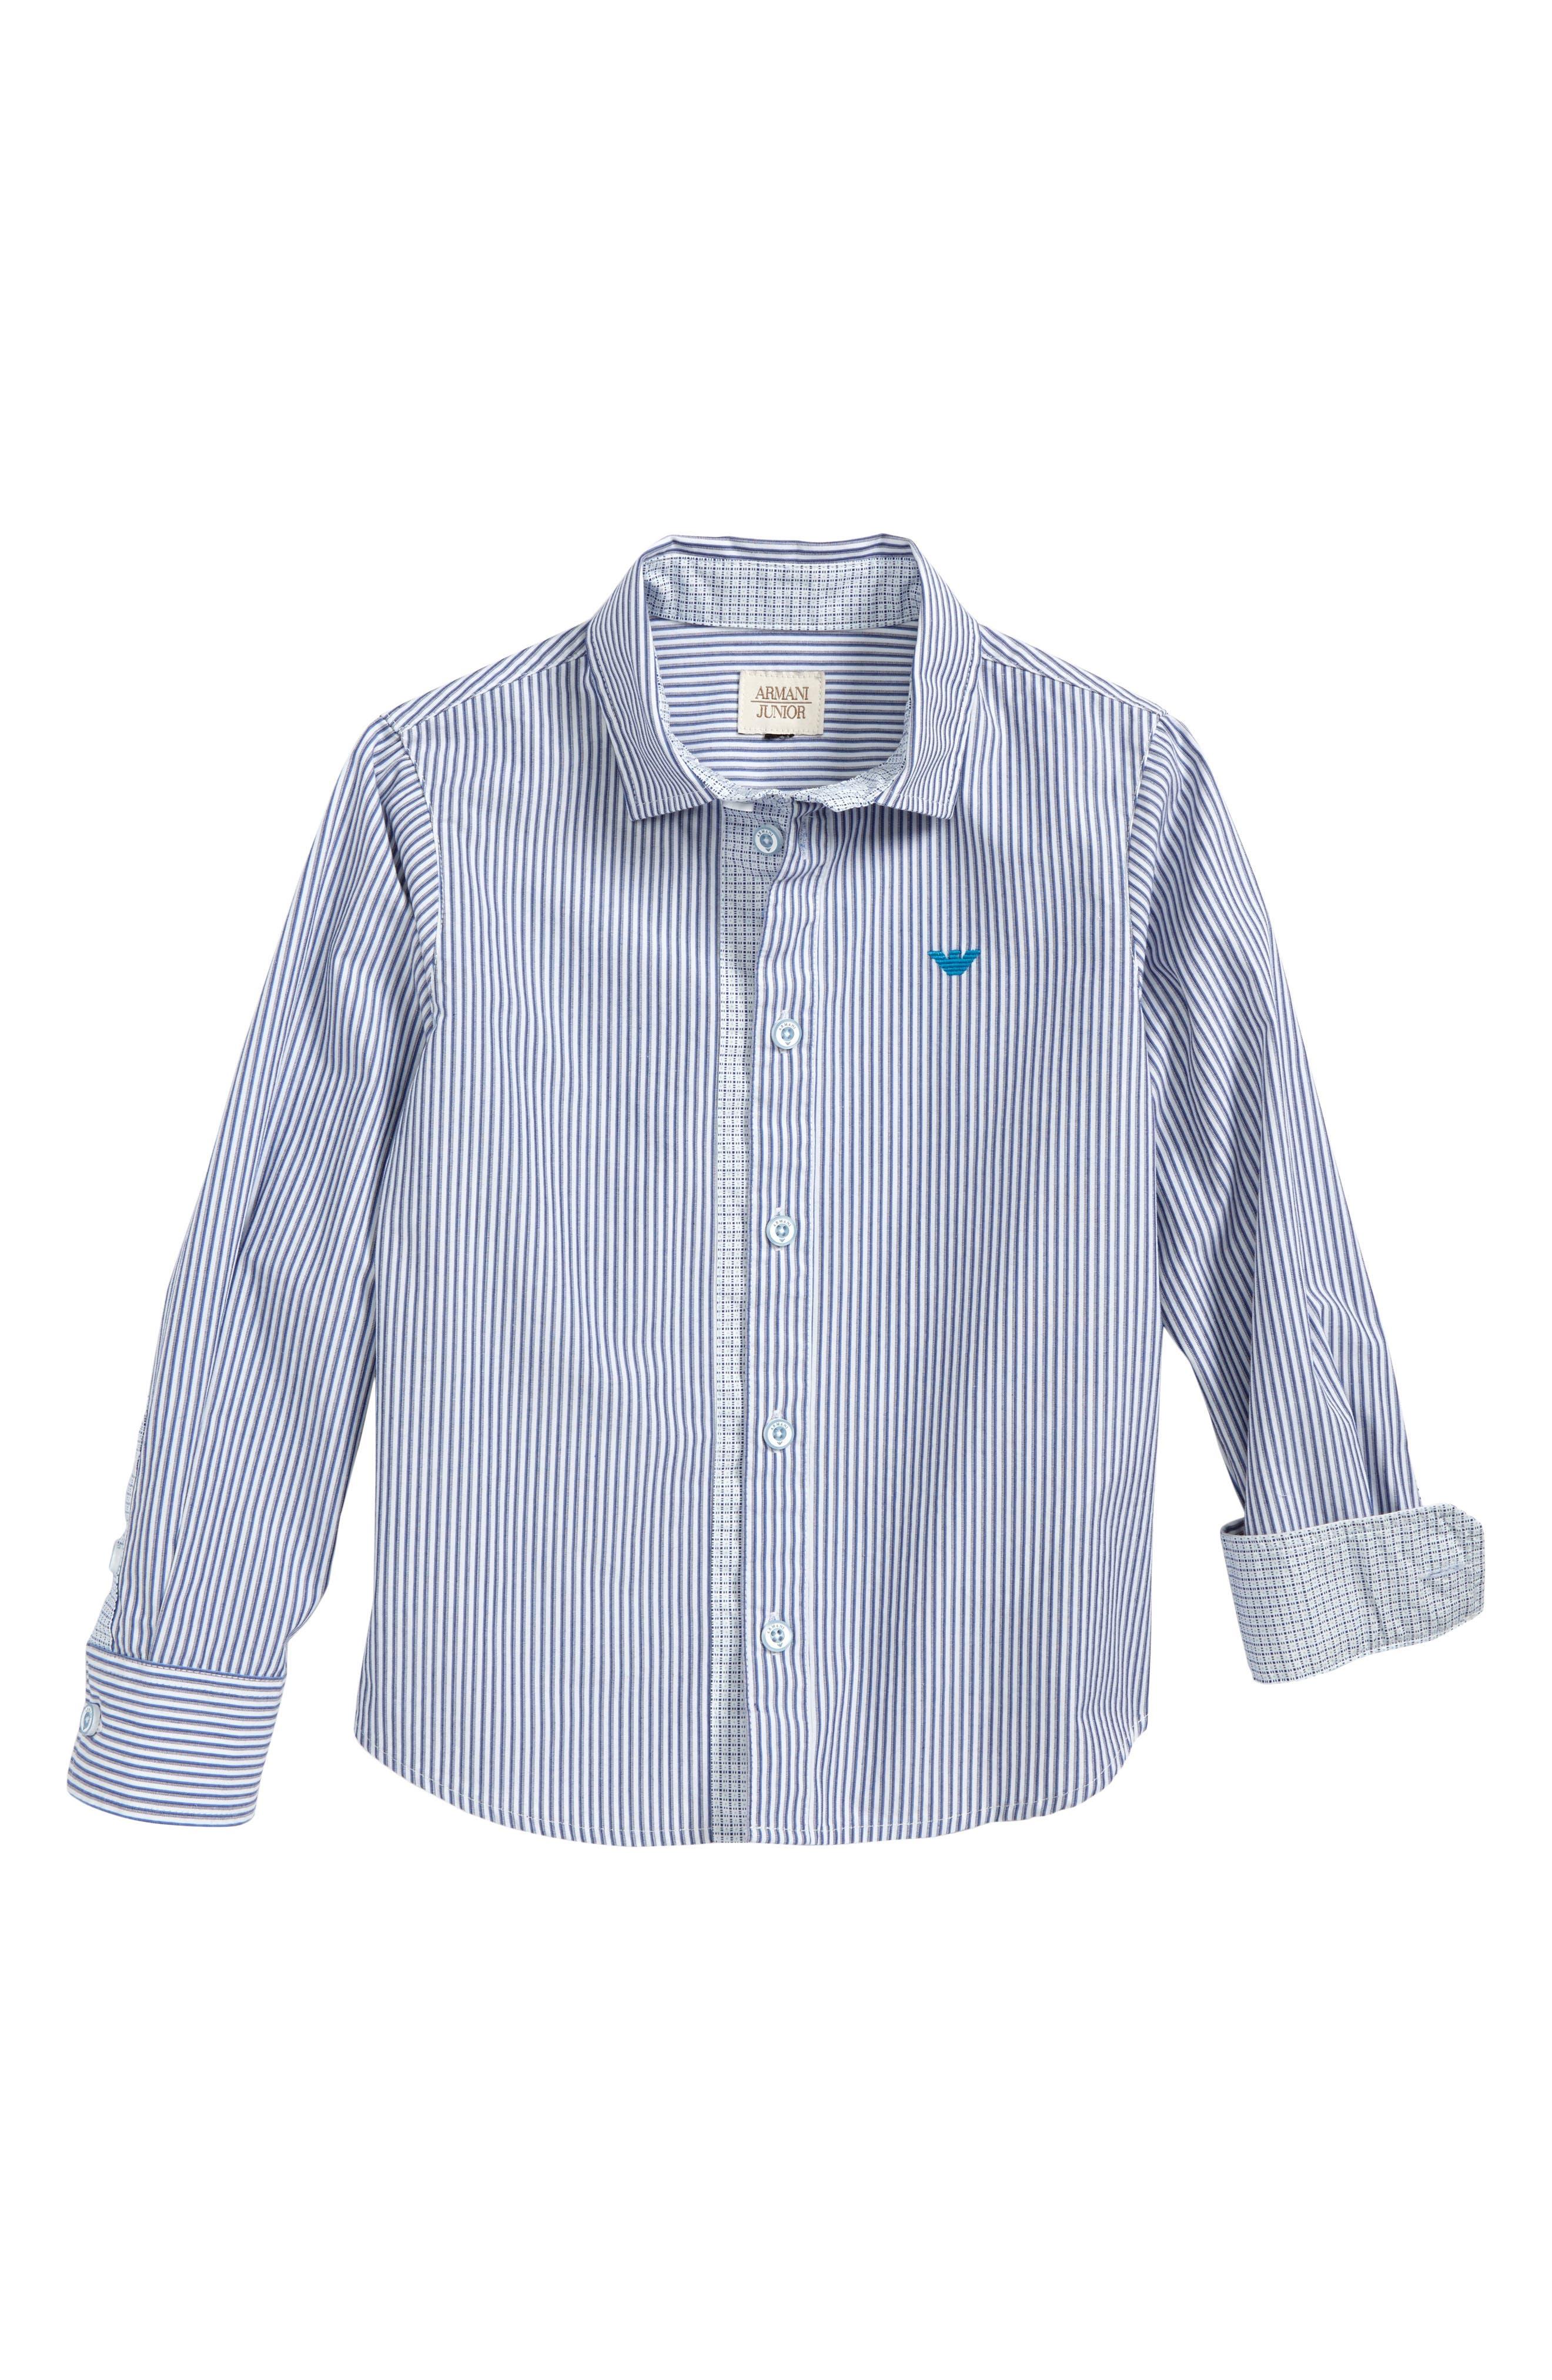 Stripe Woven Shirt,                             Main thumbnail 1, color,                             424